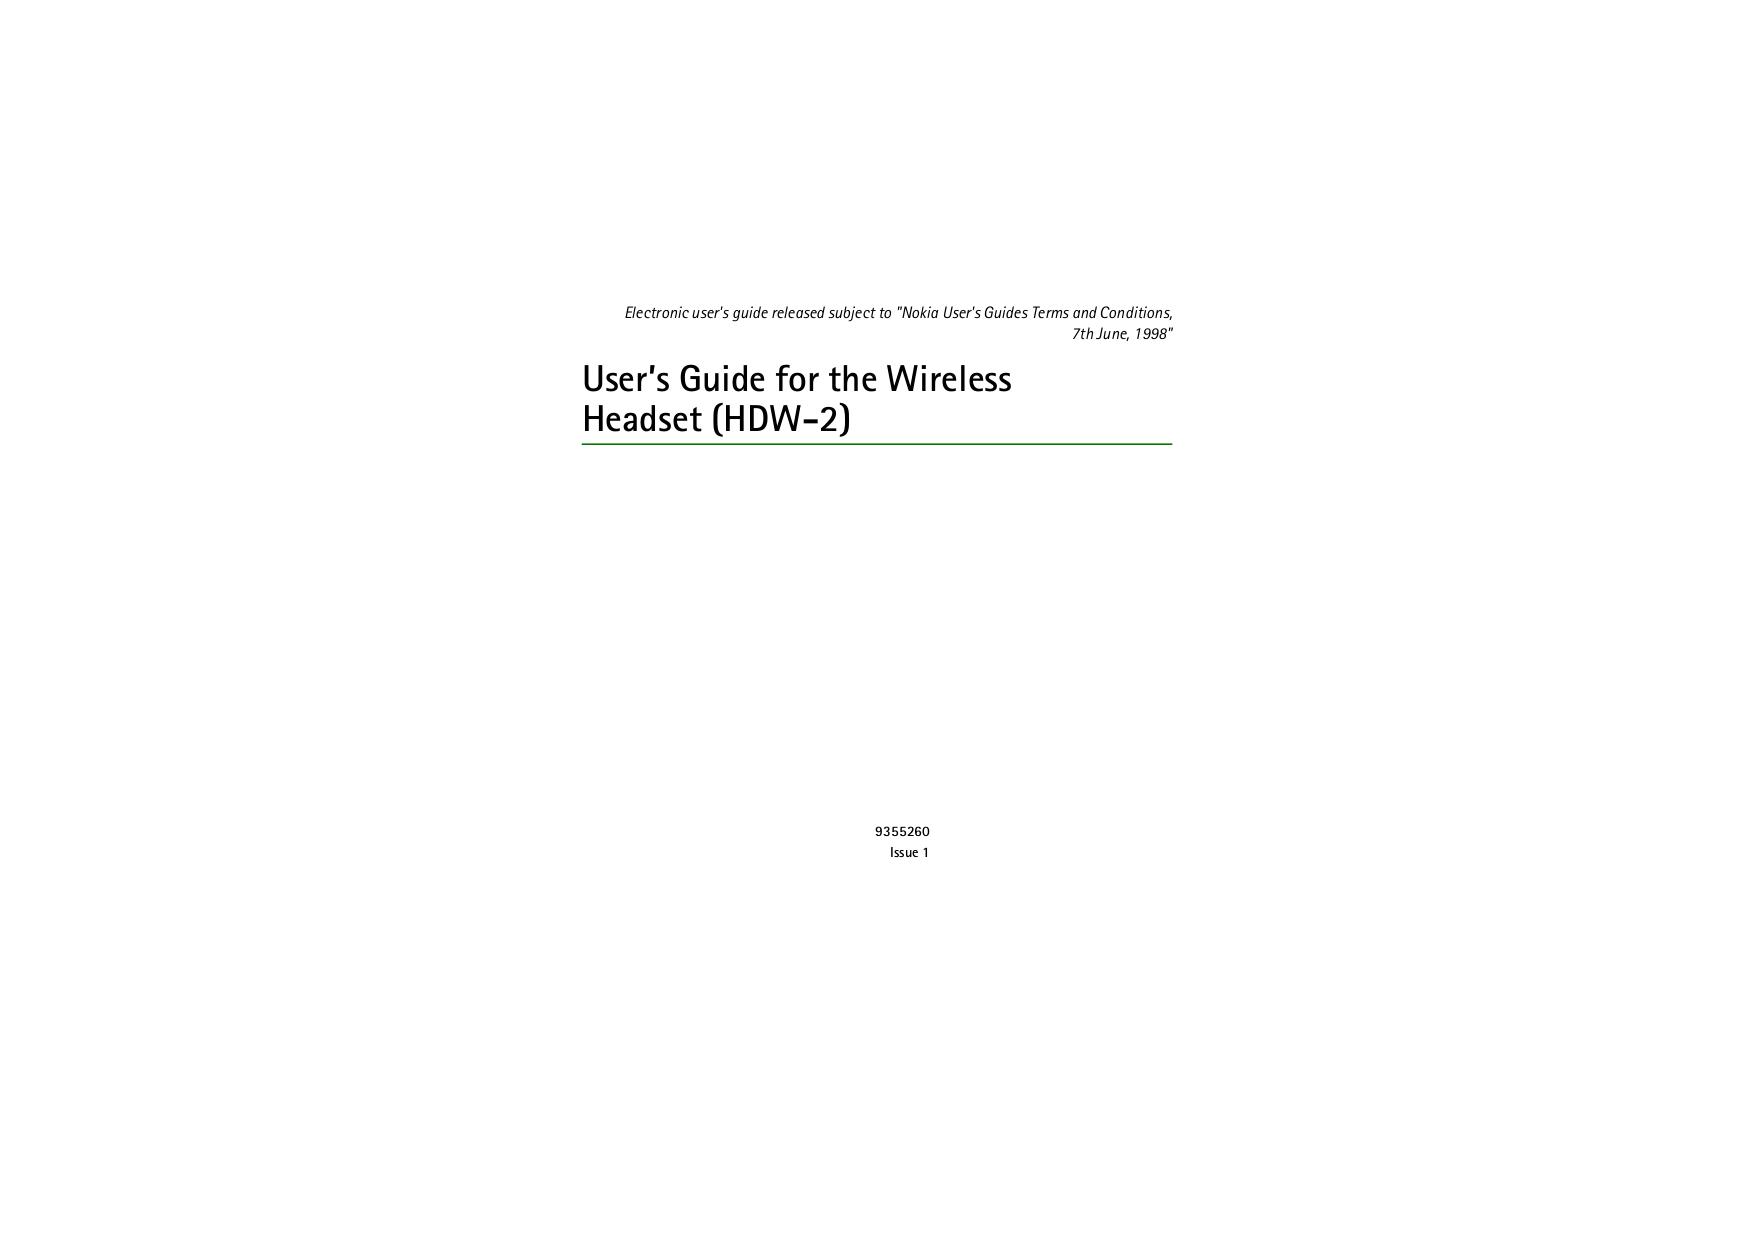 pdf for Nokia Headset HDW-2 manual